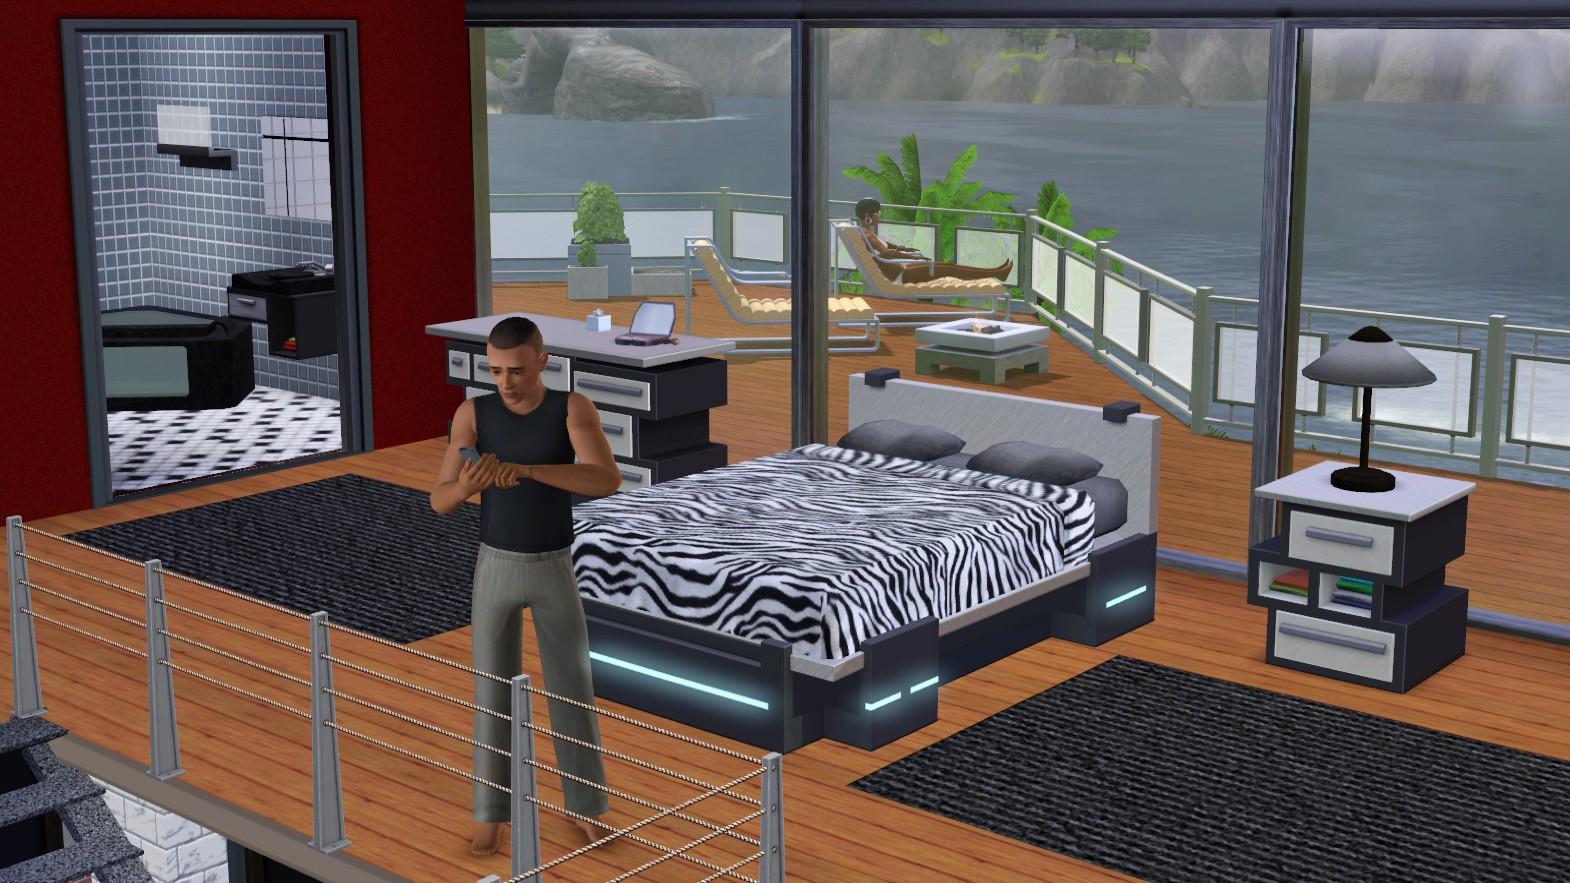 The Sims 3 - Design & Hight-Tech Stuff